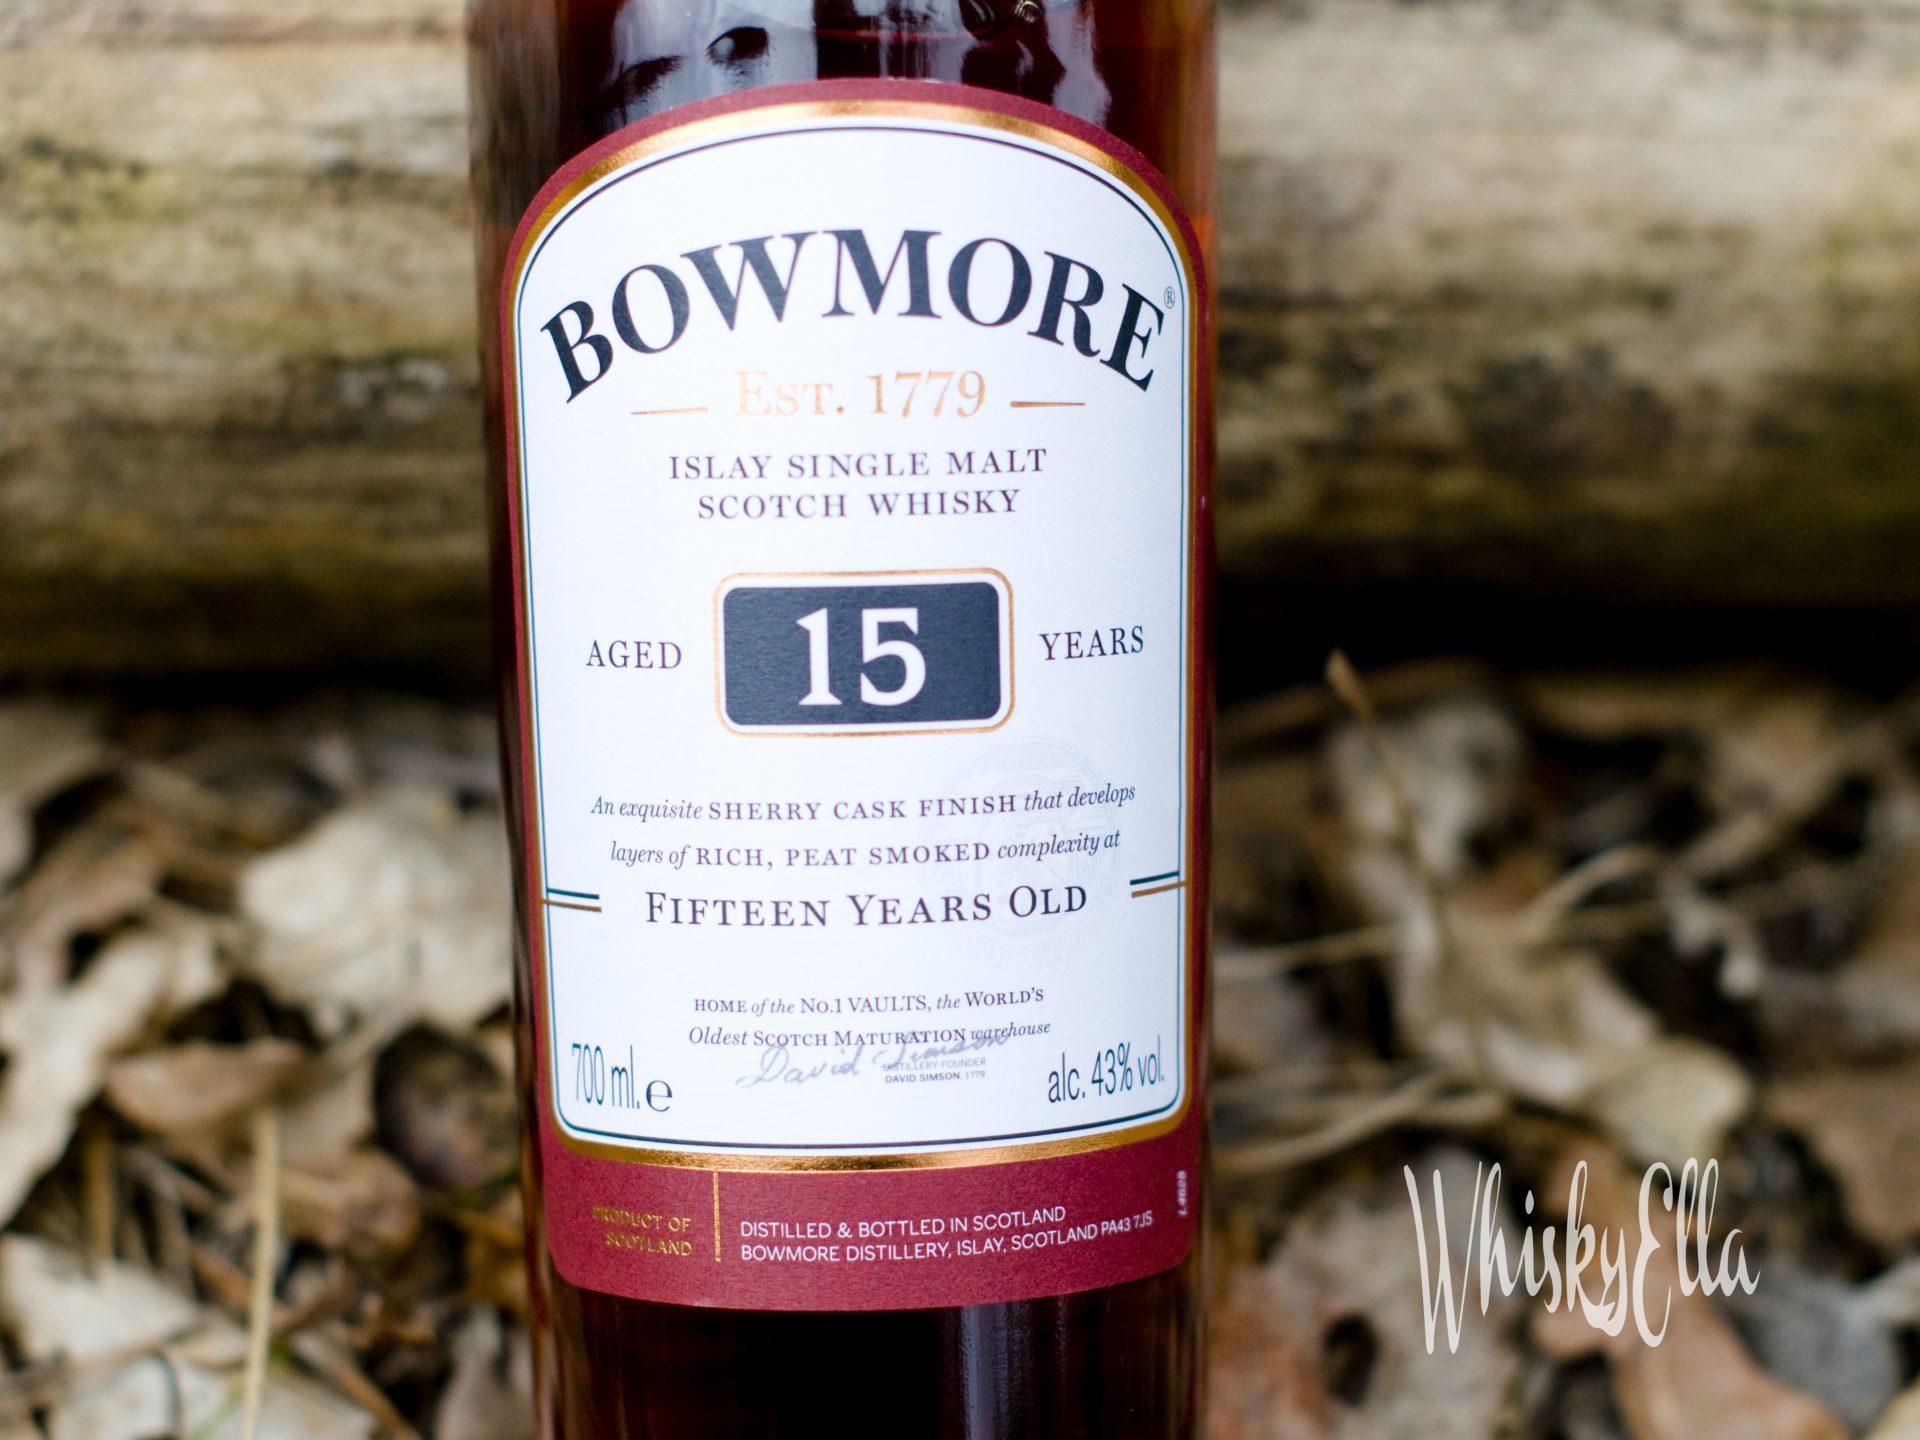 Nasza recenzja Bowmore 15 yo Sherry Cask Finish #57